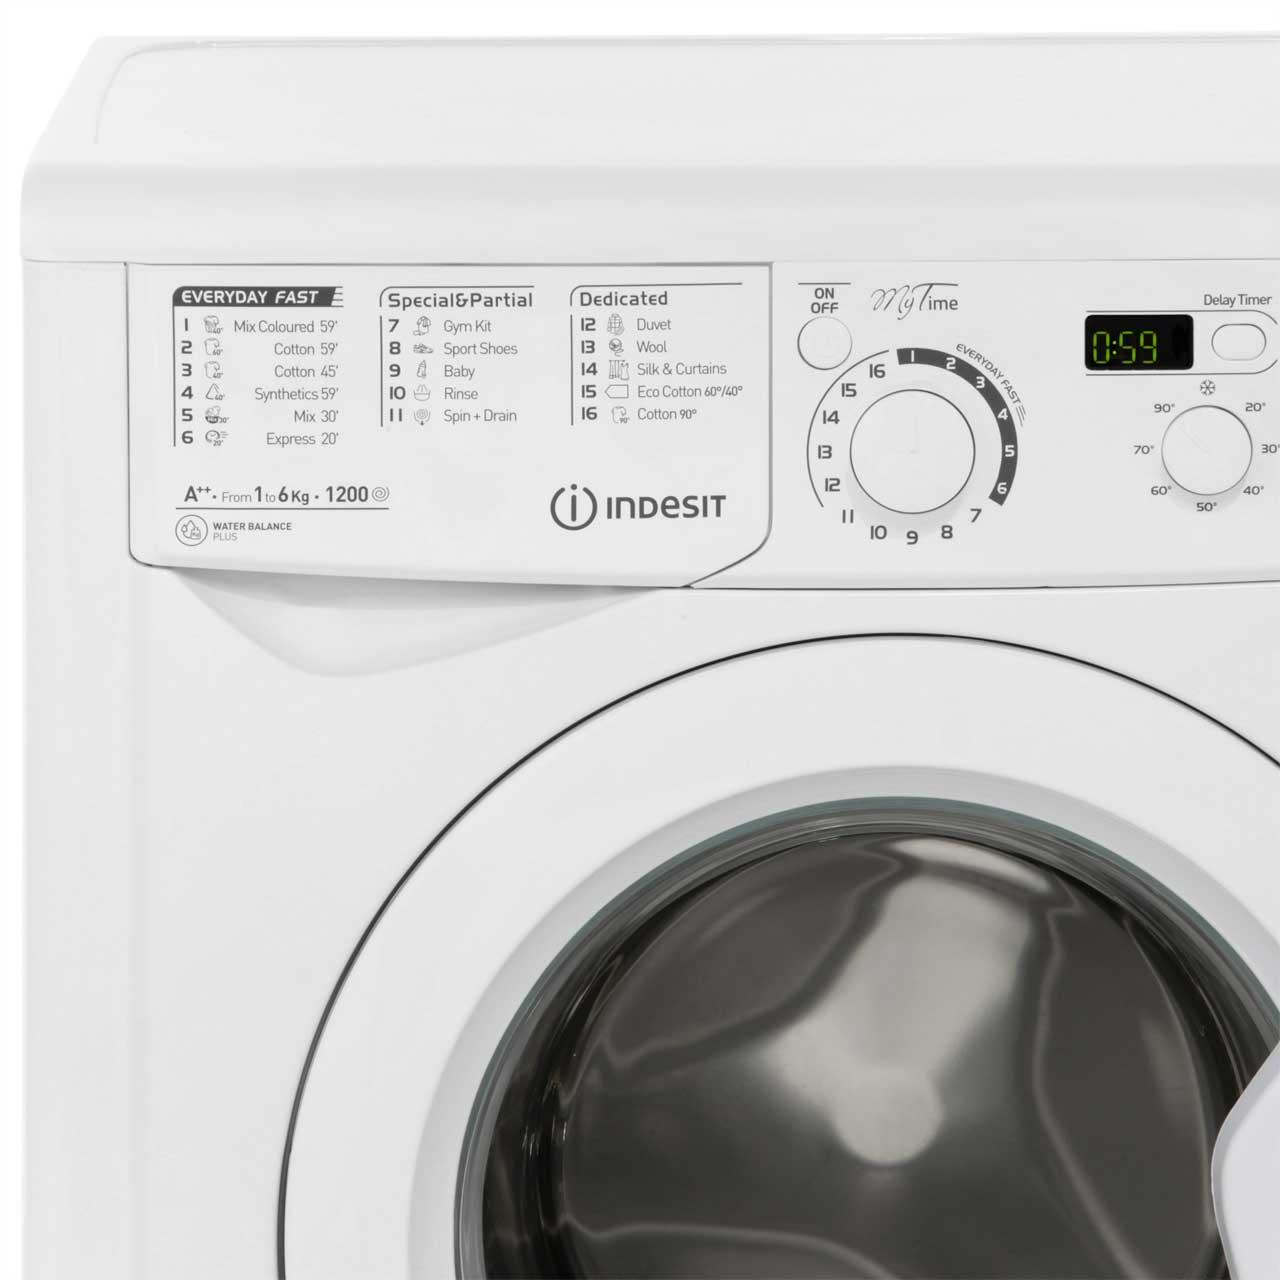 Dual 2 To 1 Drain Hose Adaptor Connector For Indesit Dishwasher Washing Machine